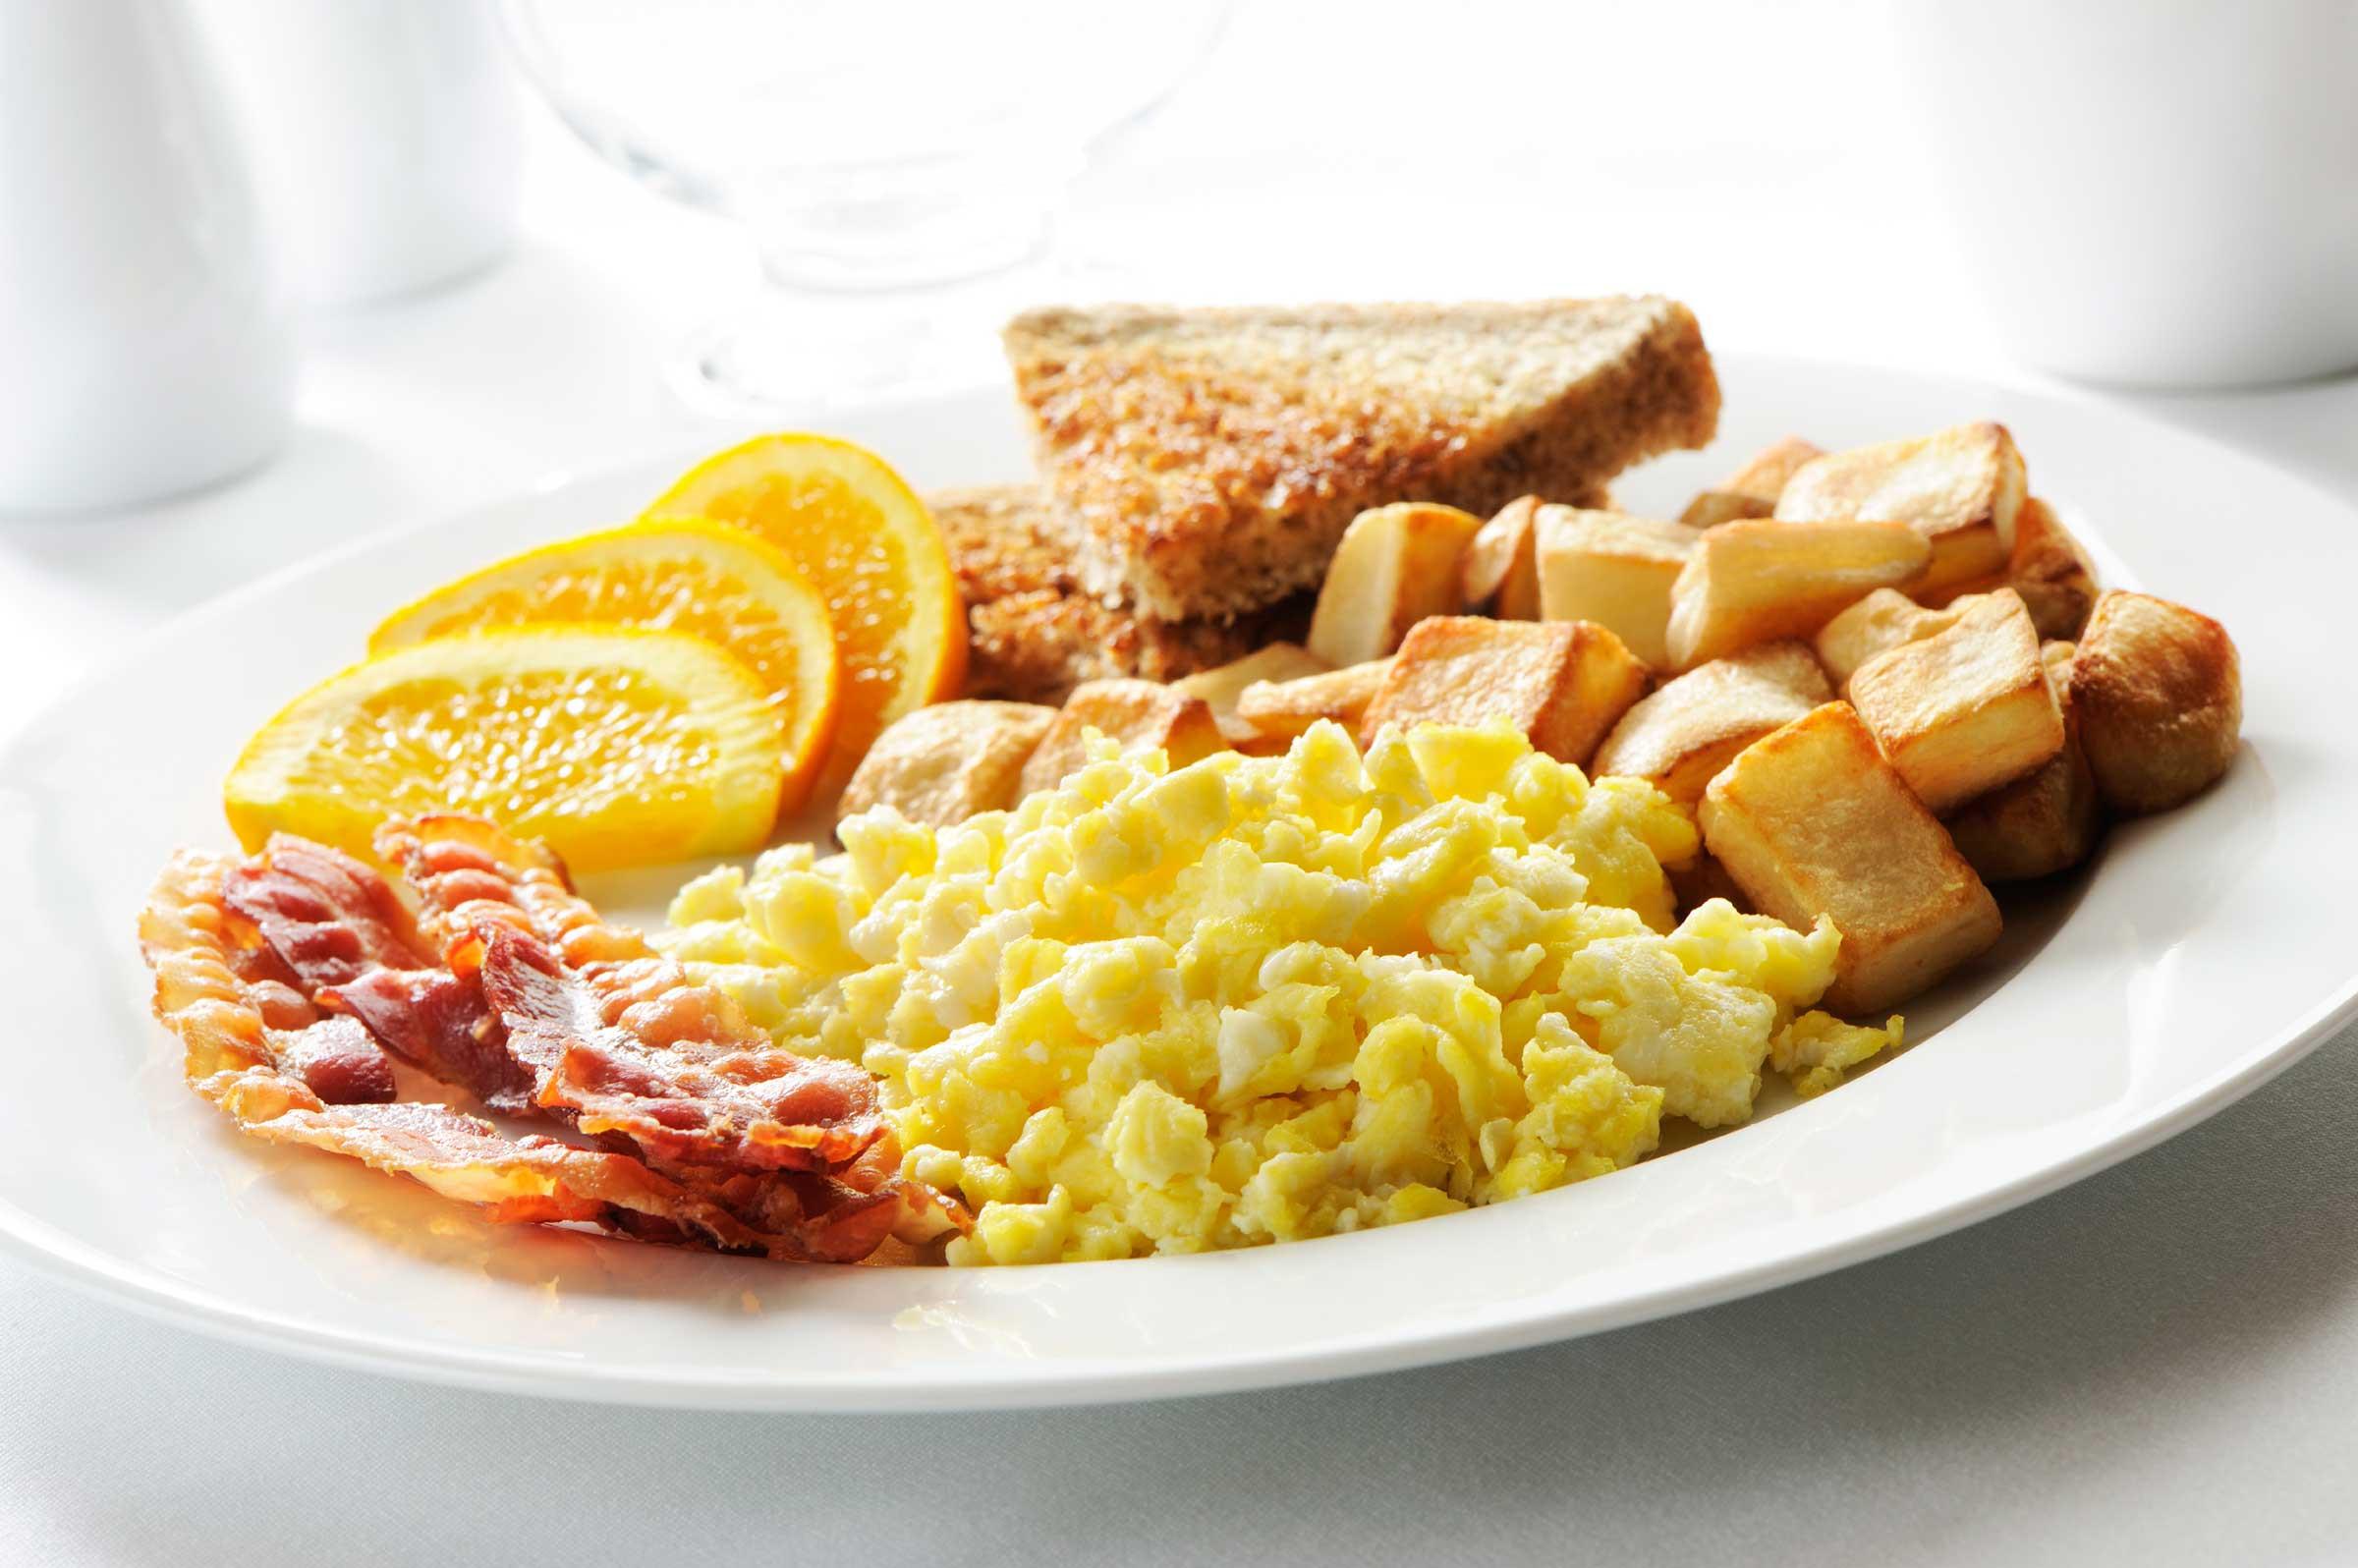 Healthy Breakfast Recipes For Diabetics  Breakfast for Diabetics 11 Healthy Tips